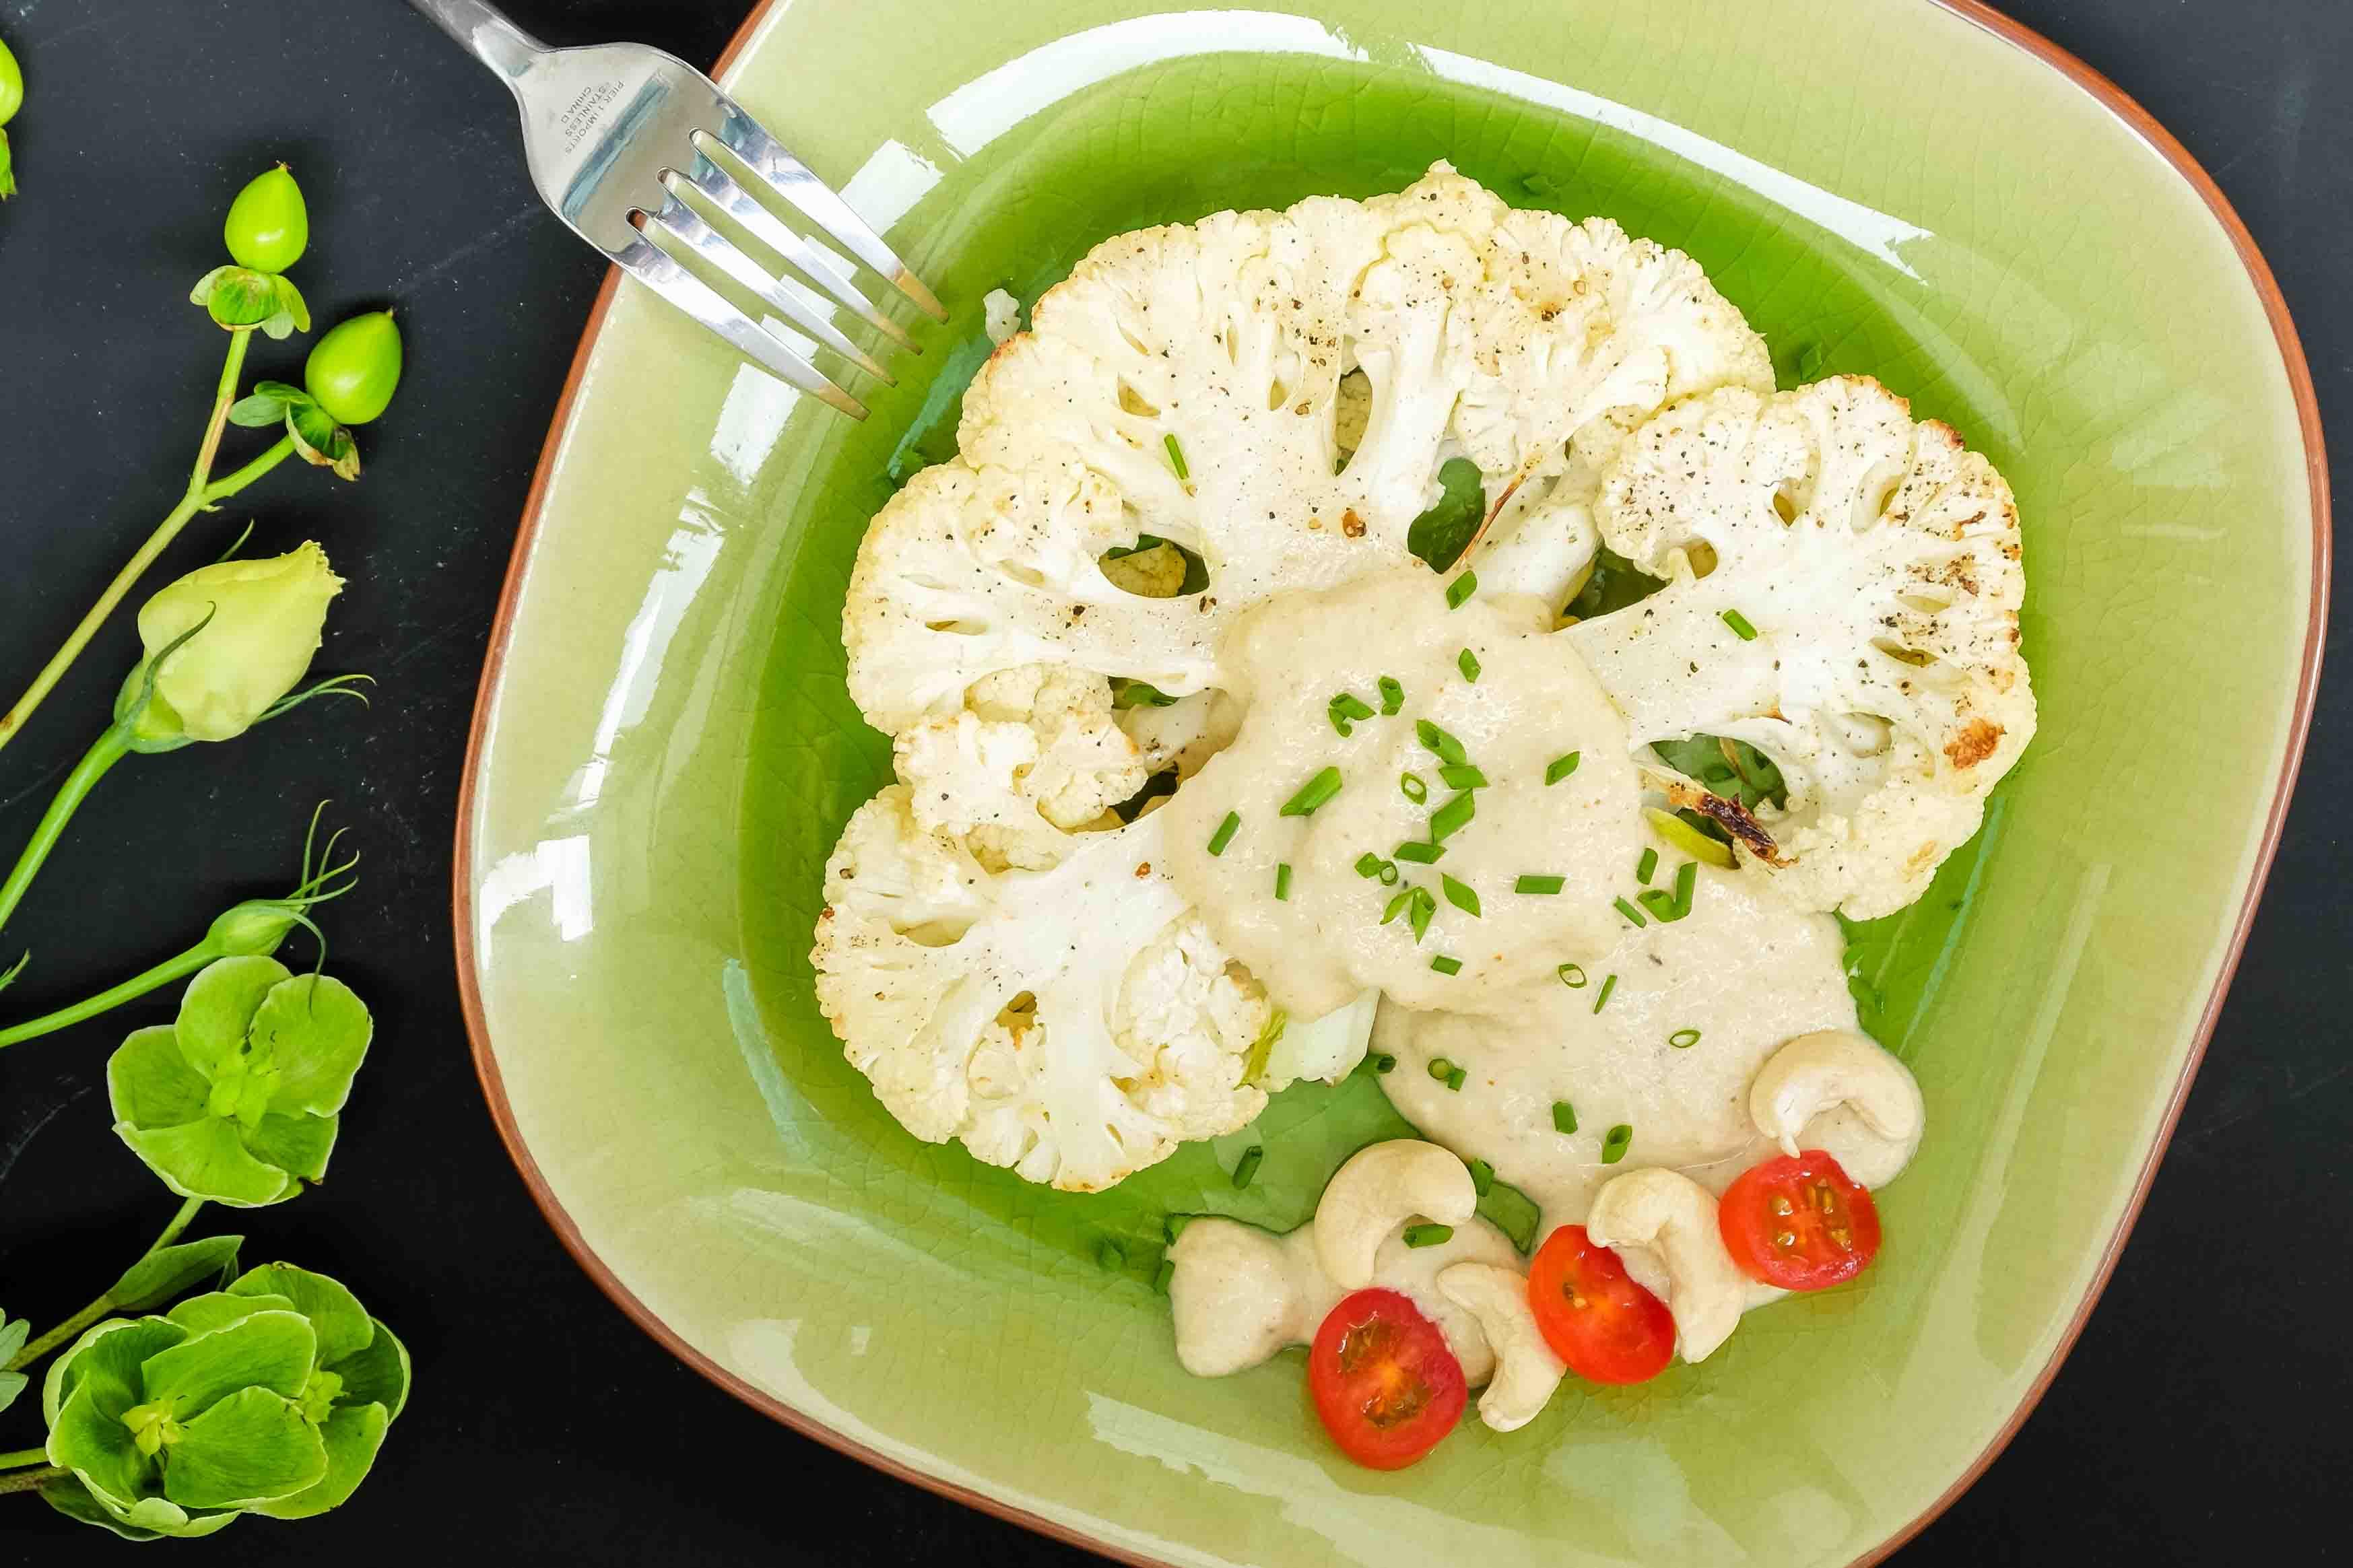 Vegan Cauliflower Steak with Cashew Sauce